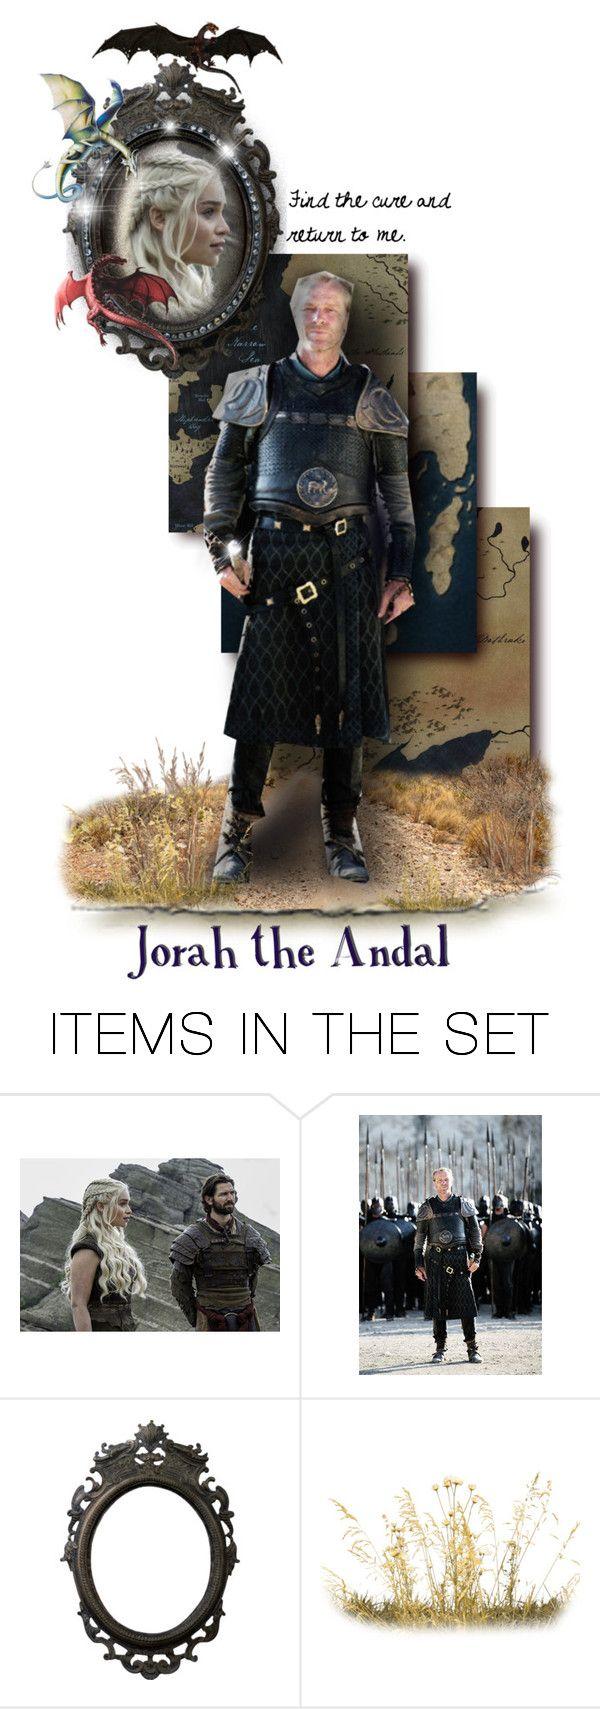 """Jorah the Andal"" by annette-heathen ❤ liked on Polyvore featuring art, GameOfThrones, housetargaryen, jorahmormont and GOTDolls"